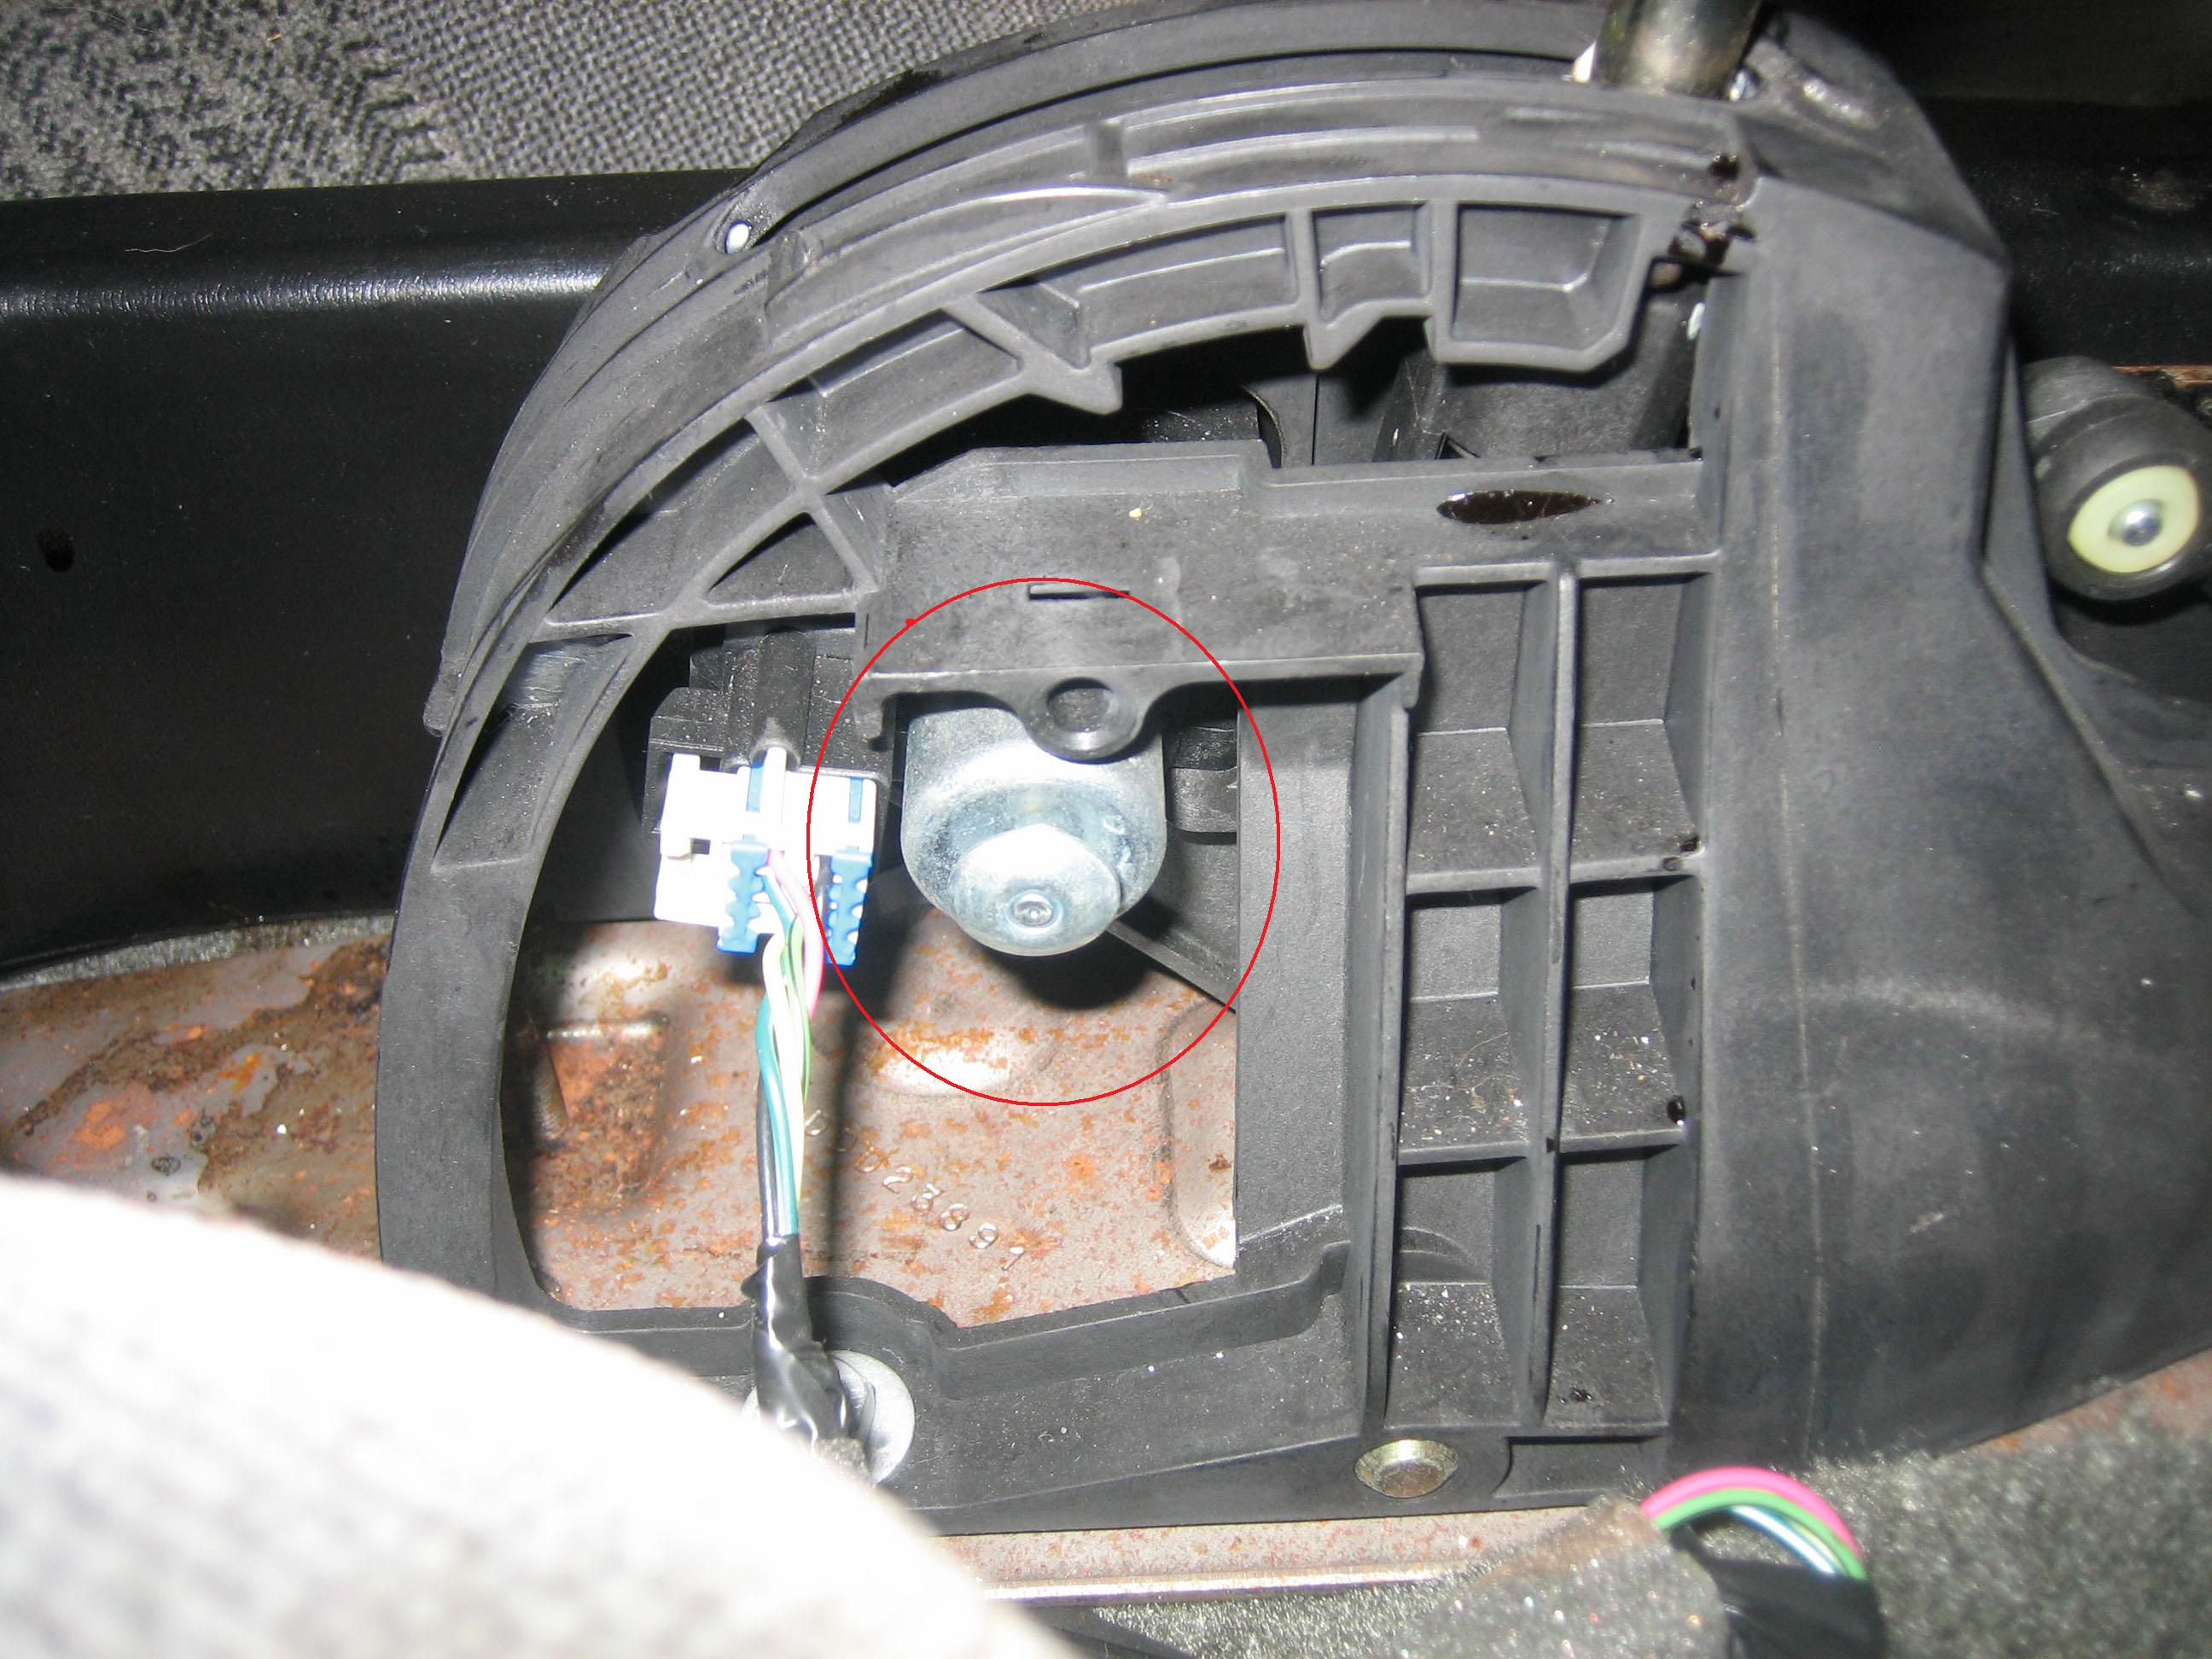 2004 Chevy Trailblazer Parts Diagram